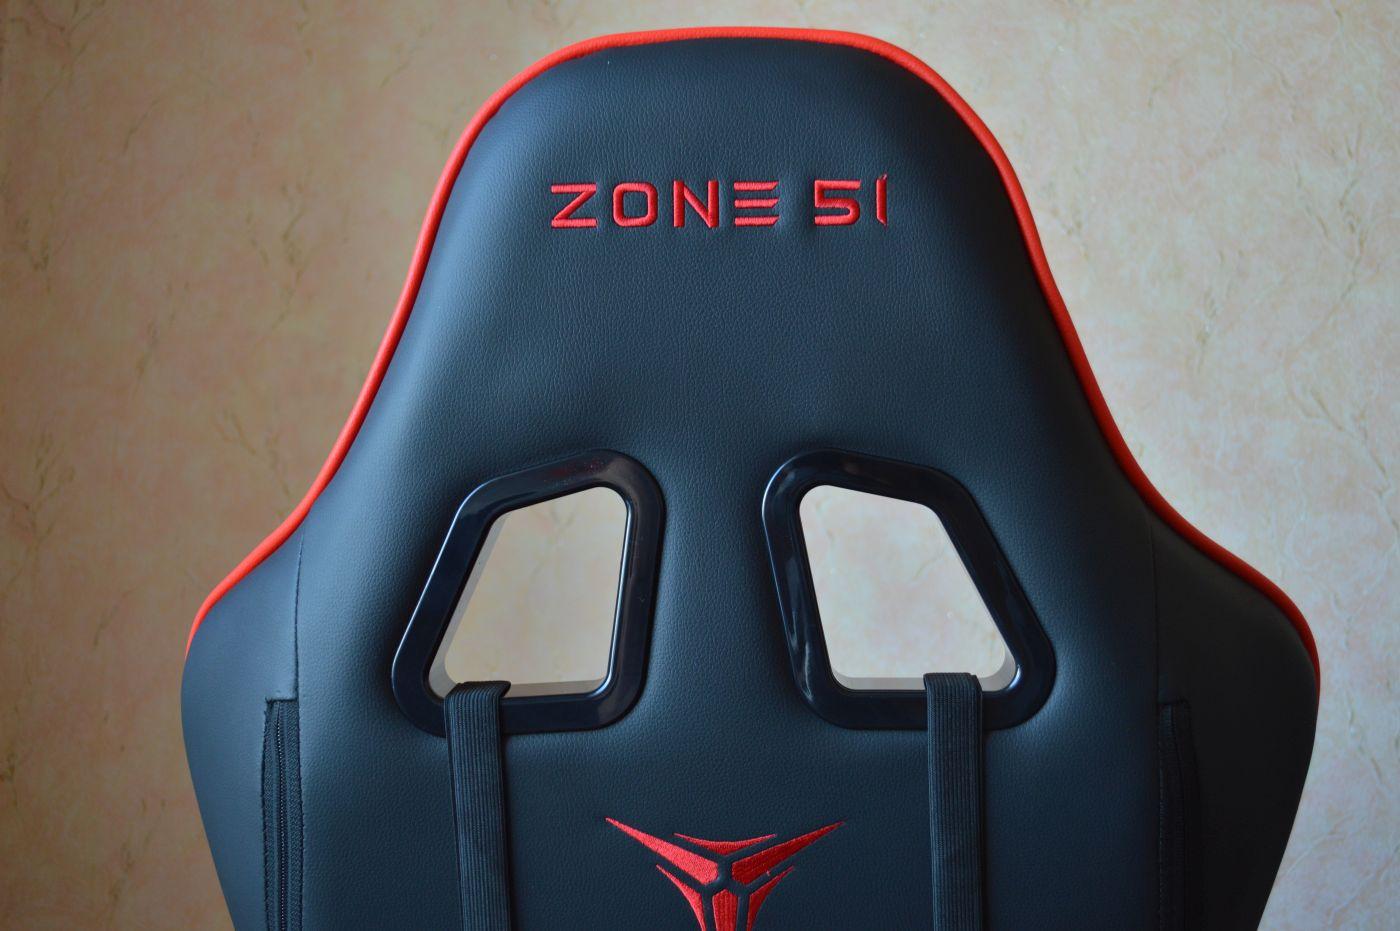 логотип компьютерного игрового кресла Zone 51 Gravity